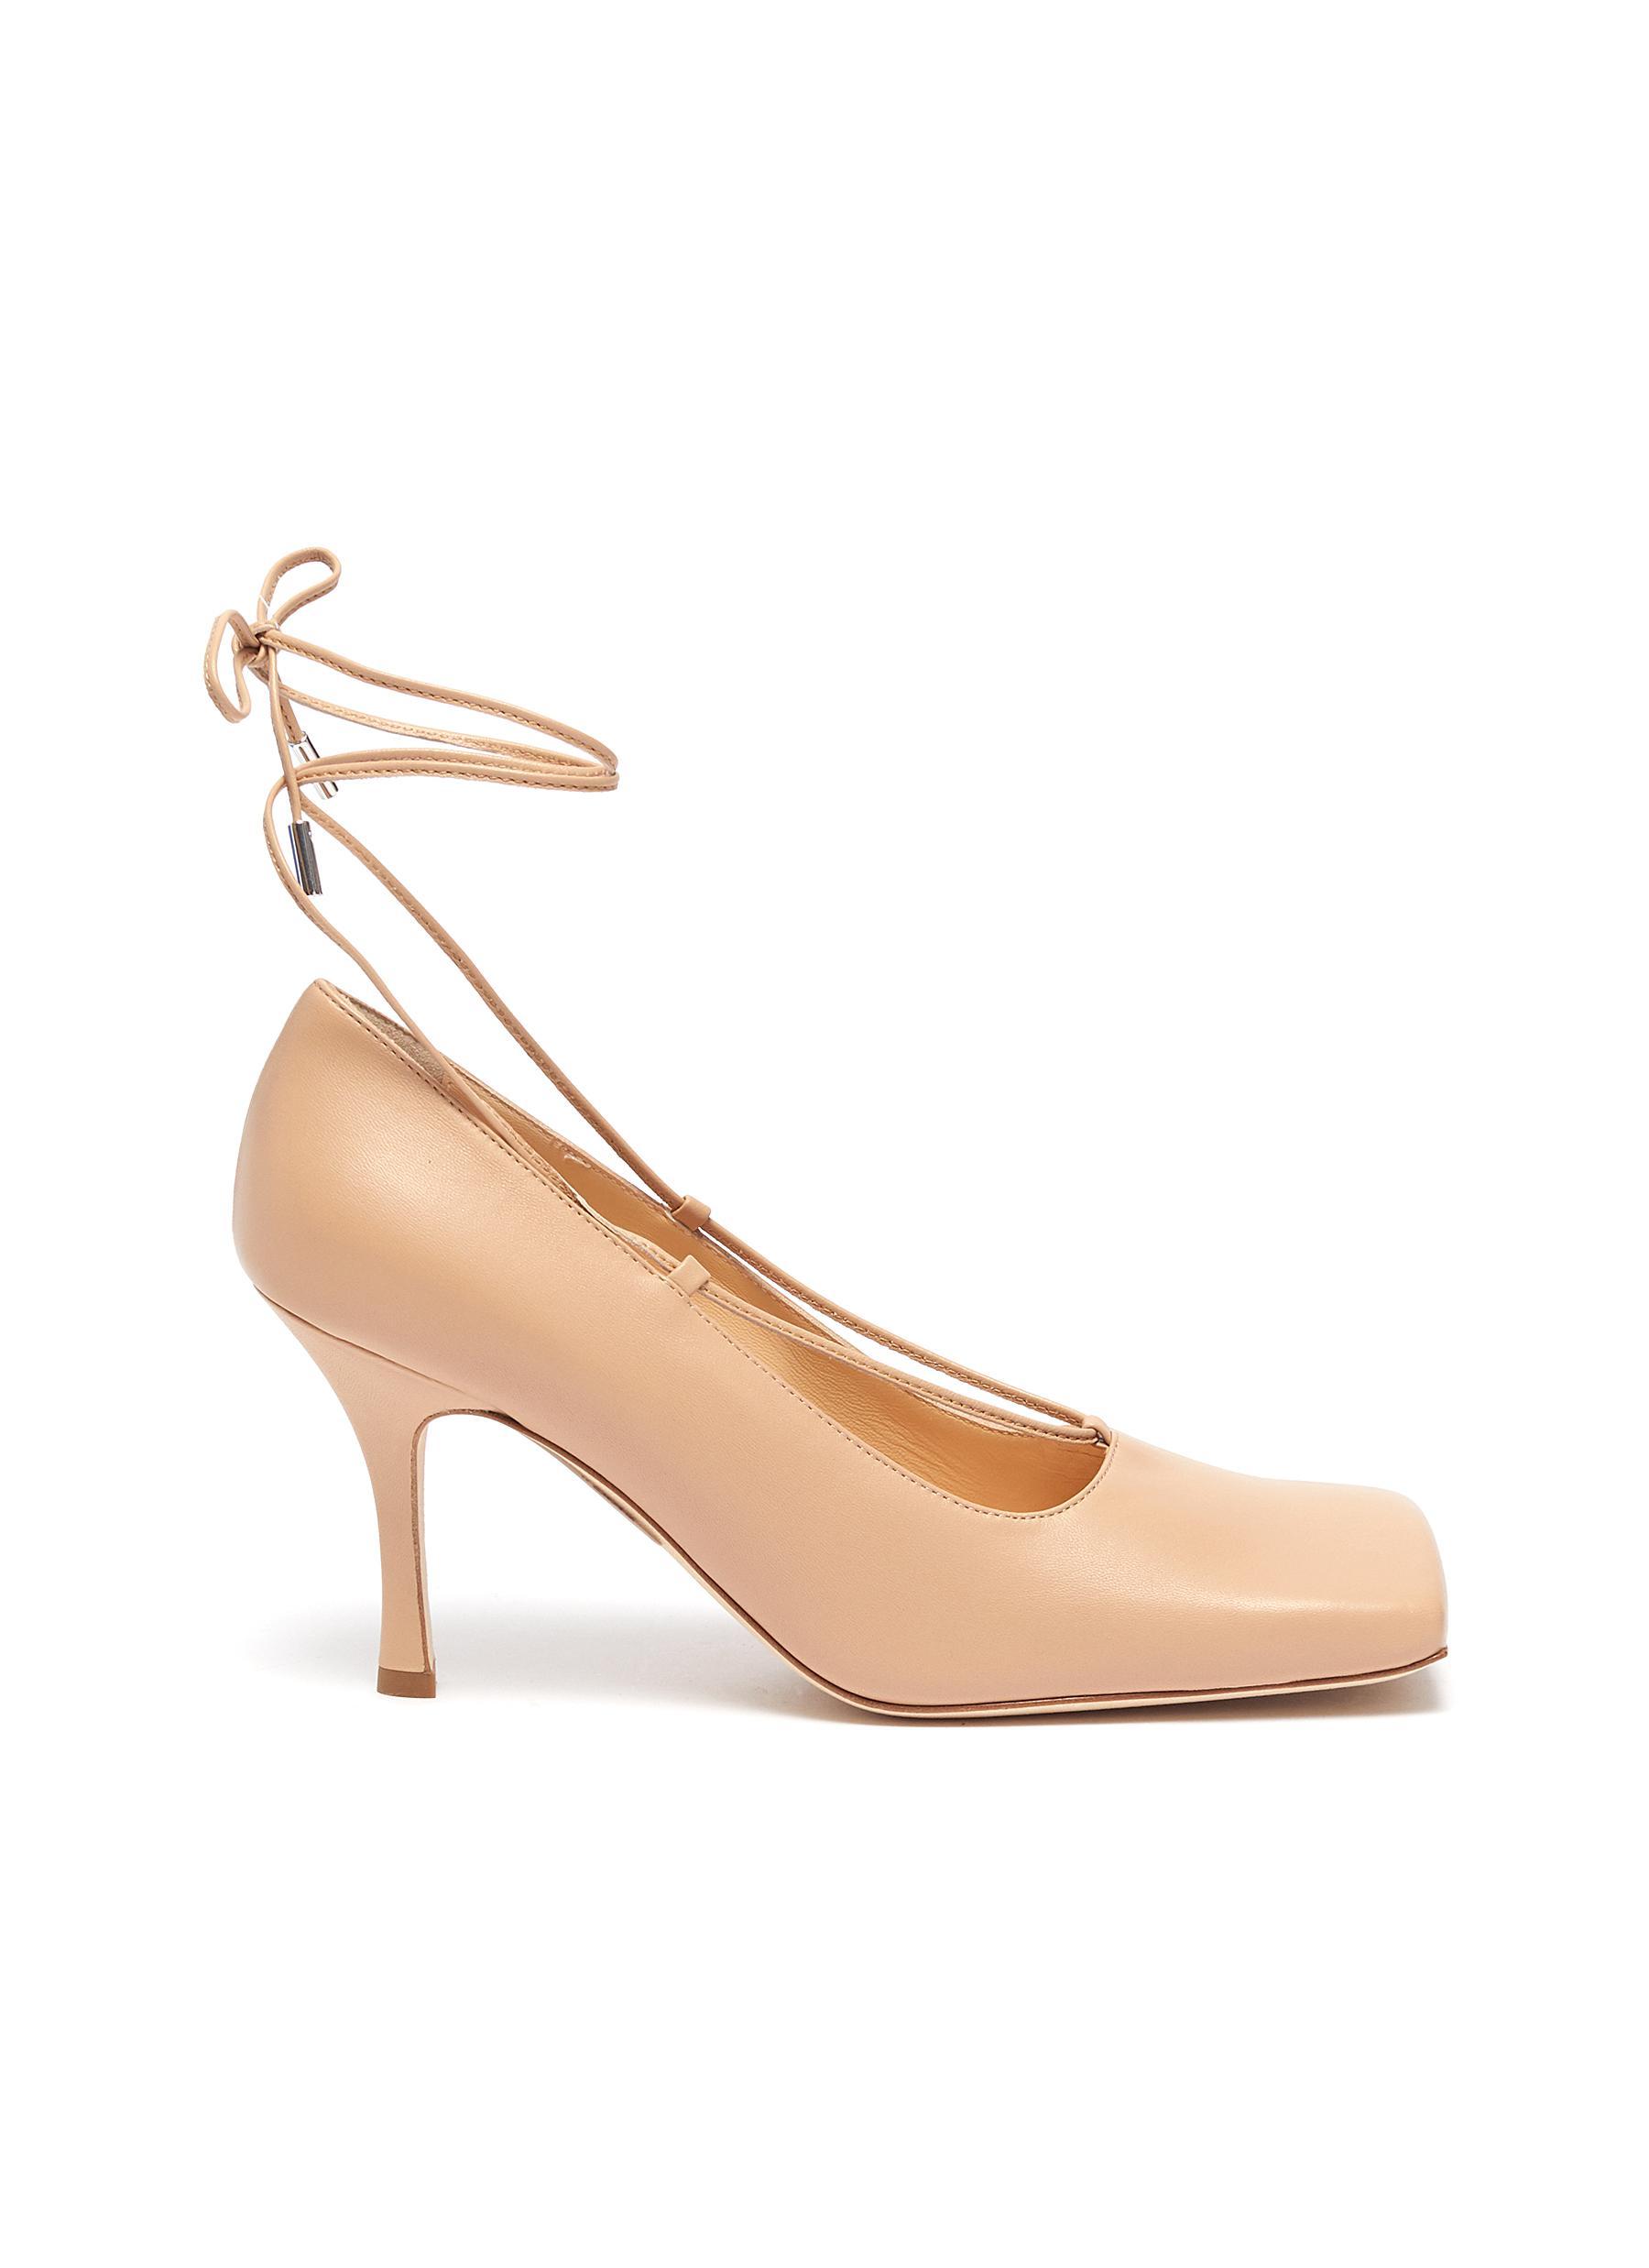 A.W.A.K.E. Mode High Heels Ursula square toe ankle tie leather pumps